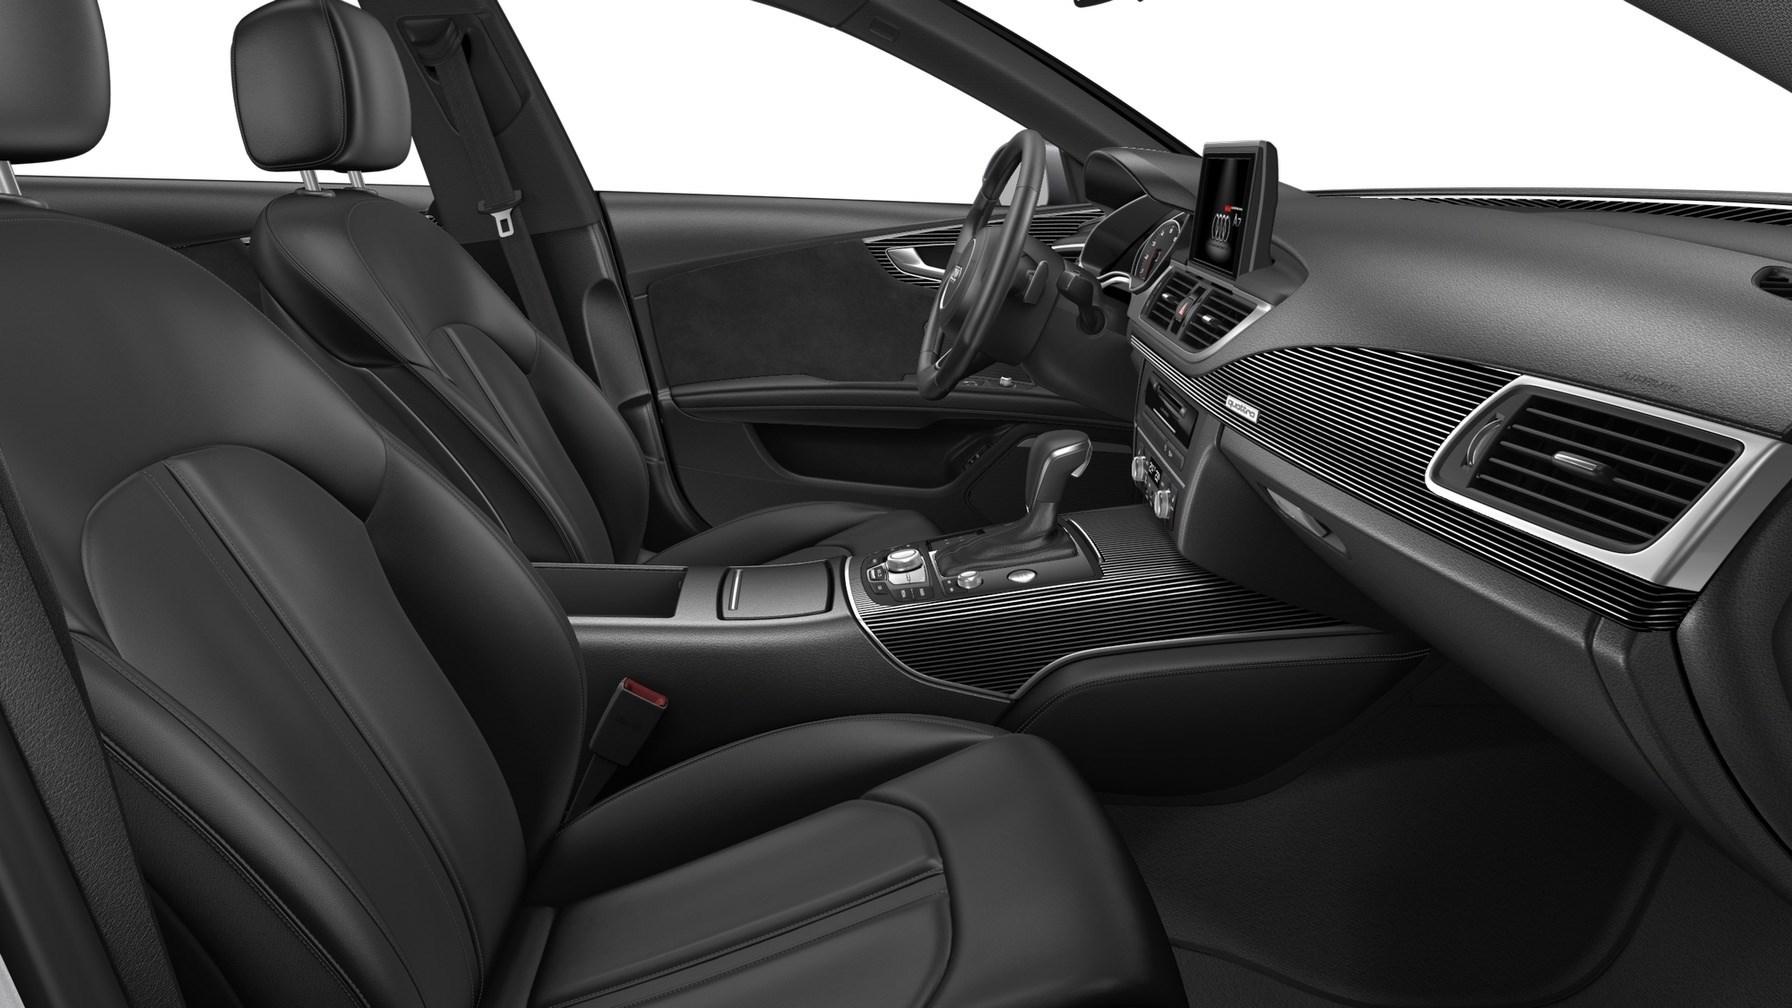 Audi A7 Sportback 3.0 V6 TDI Competition quattro